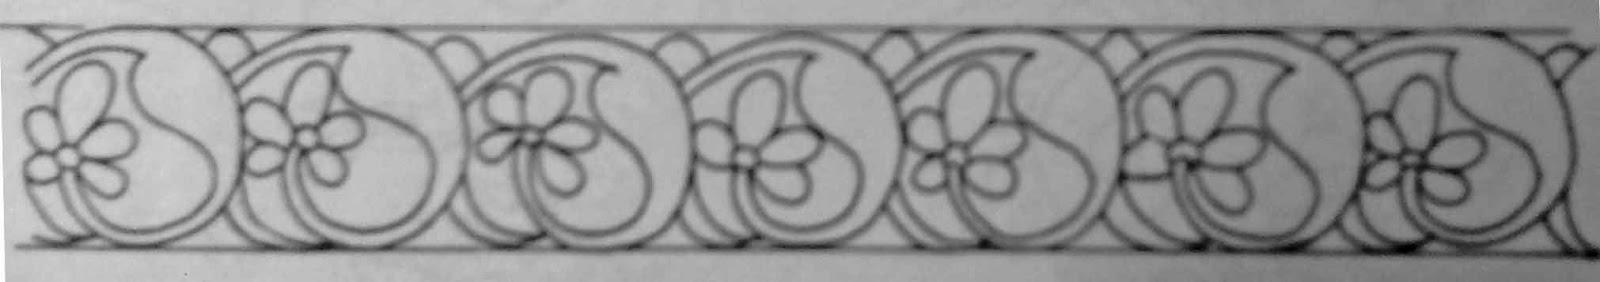 The Fashion Board Hand Embroidery Designs